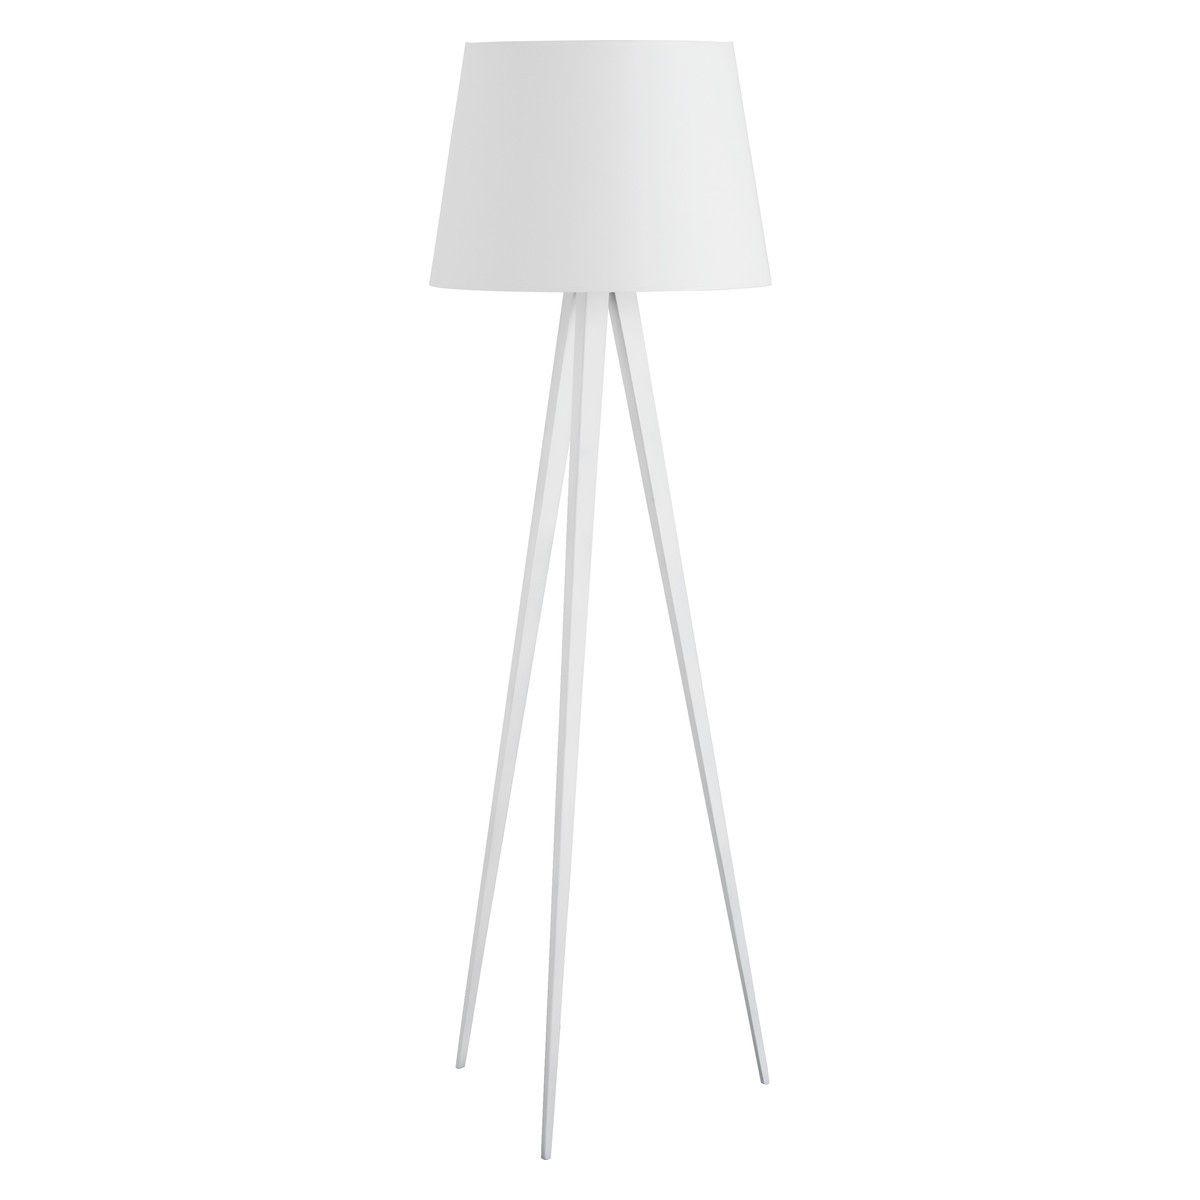 YVES White Floor Lamp With White Shade